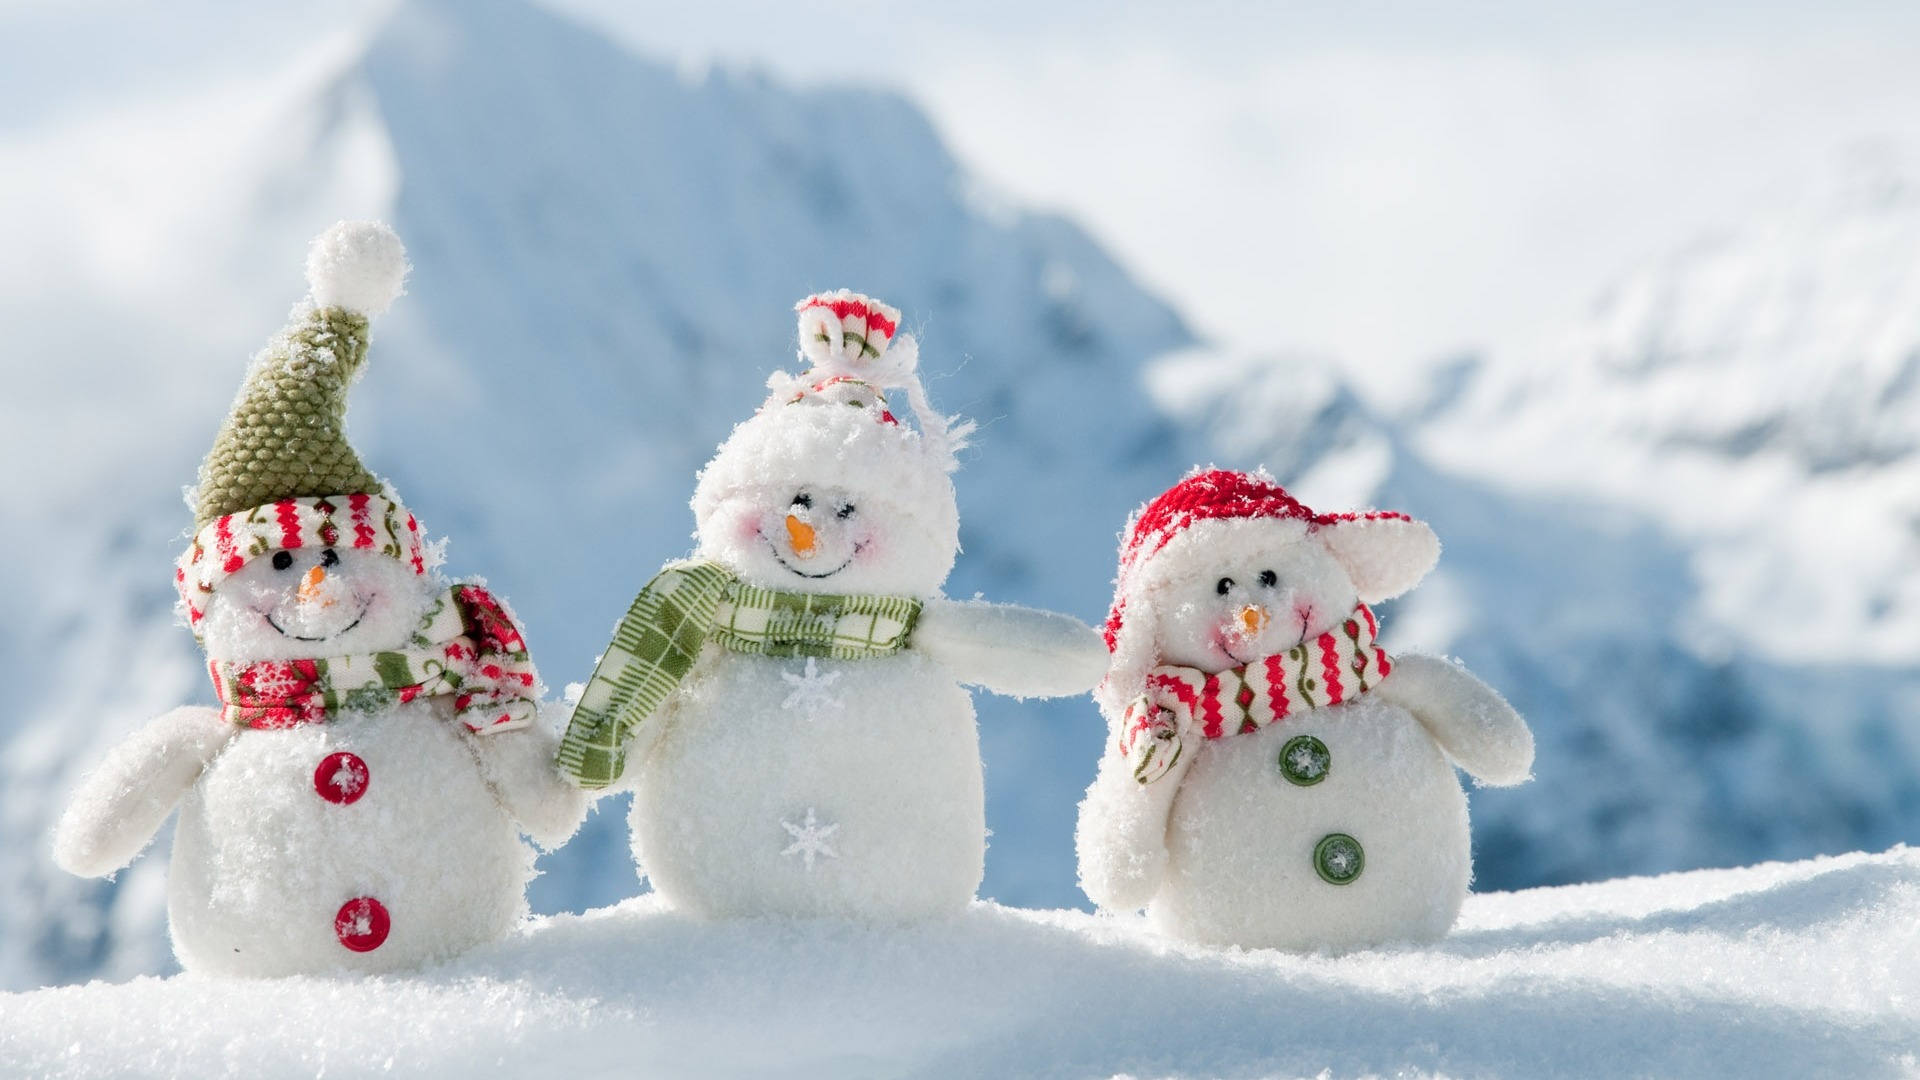 Snowman Desktop Wallpaper Winter Scenery Preview 10wallpaper Com